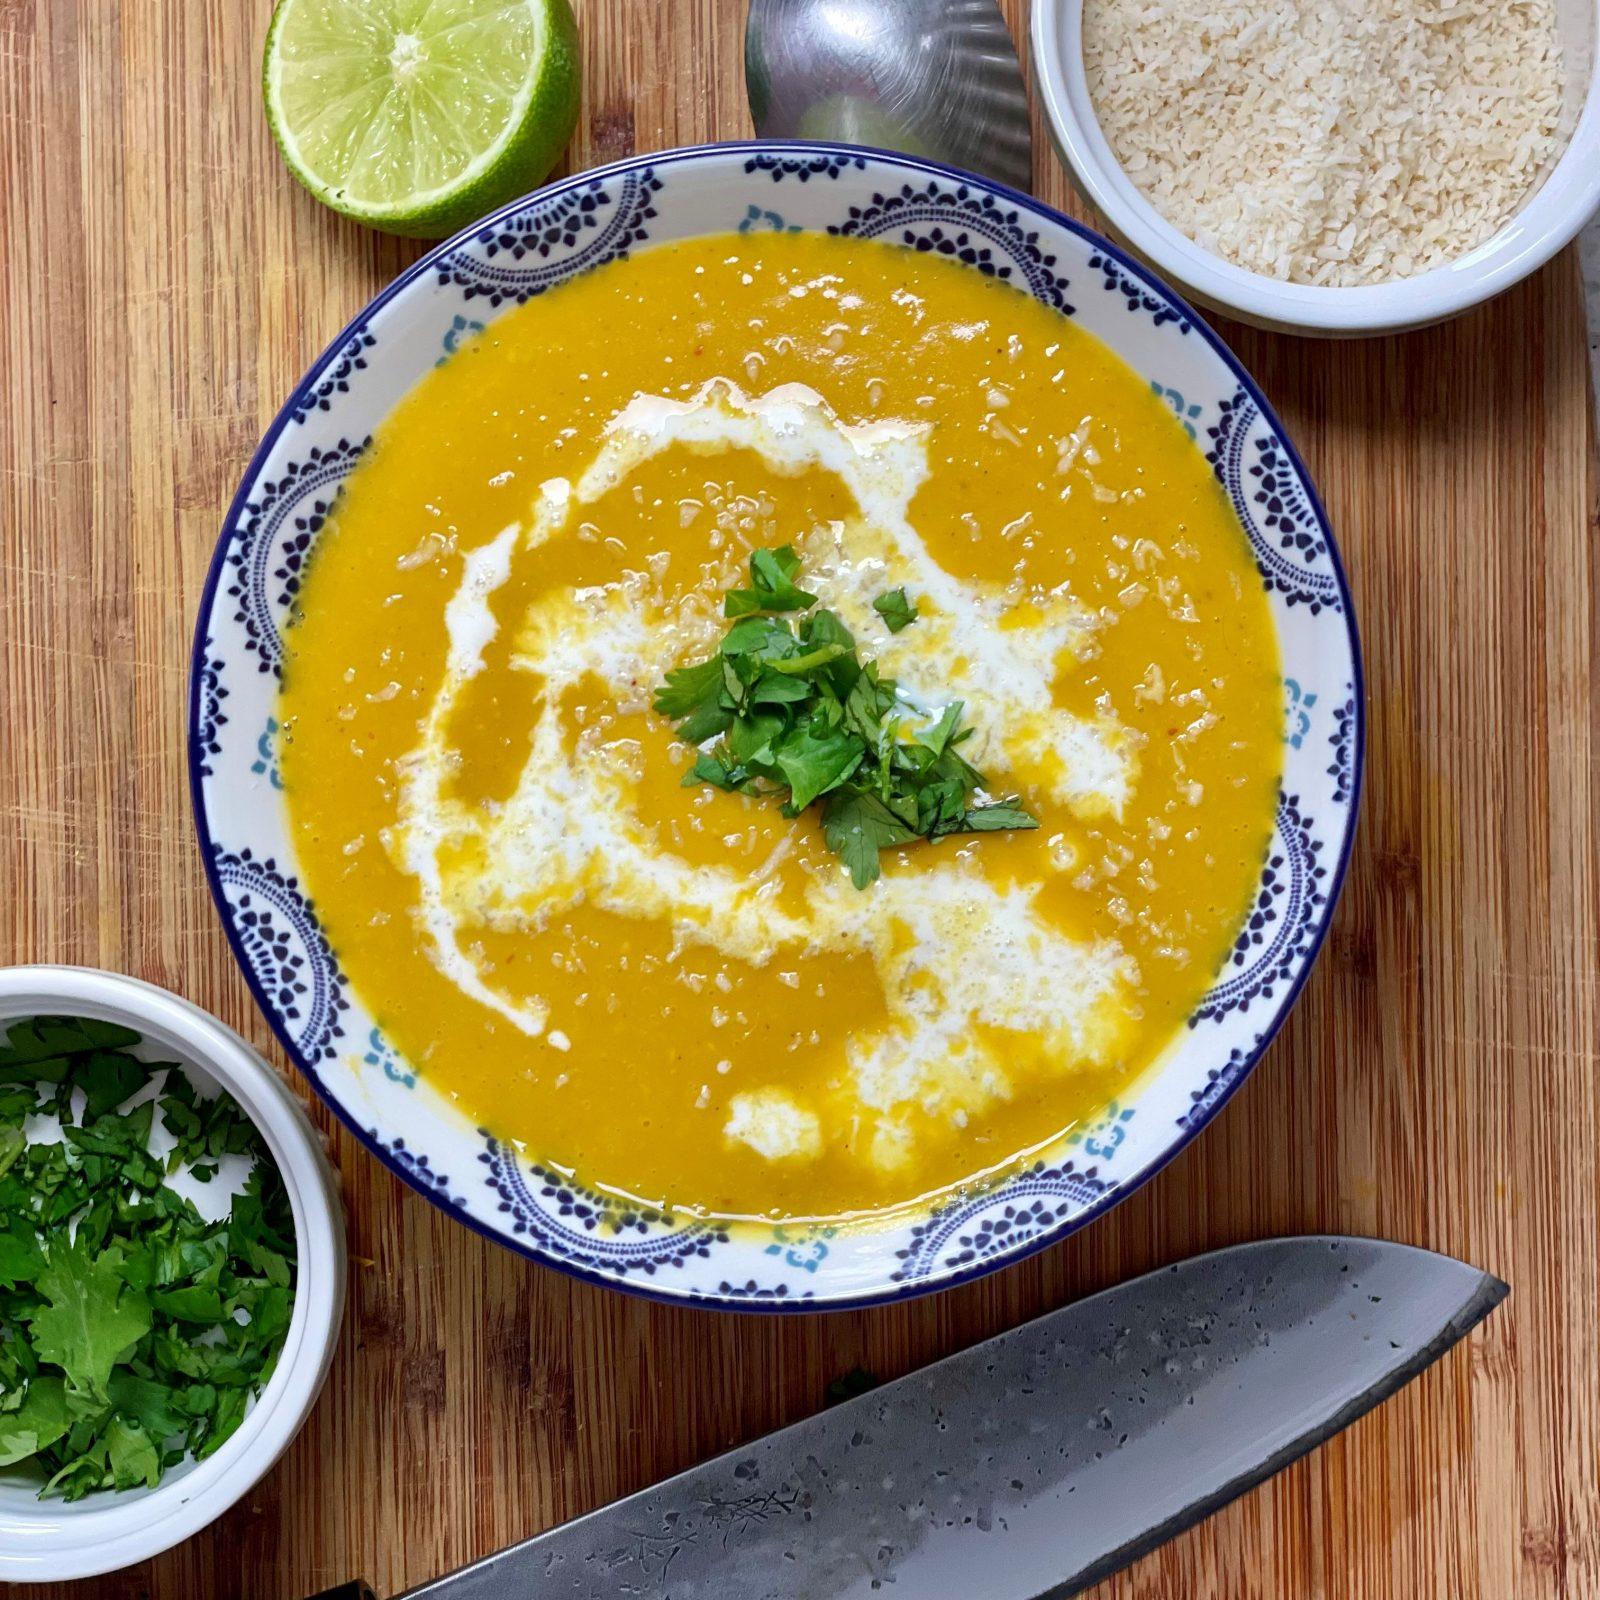 yeg edmonton recipe soup butternut squash creamy